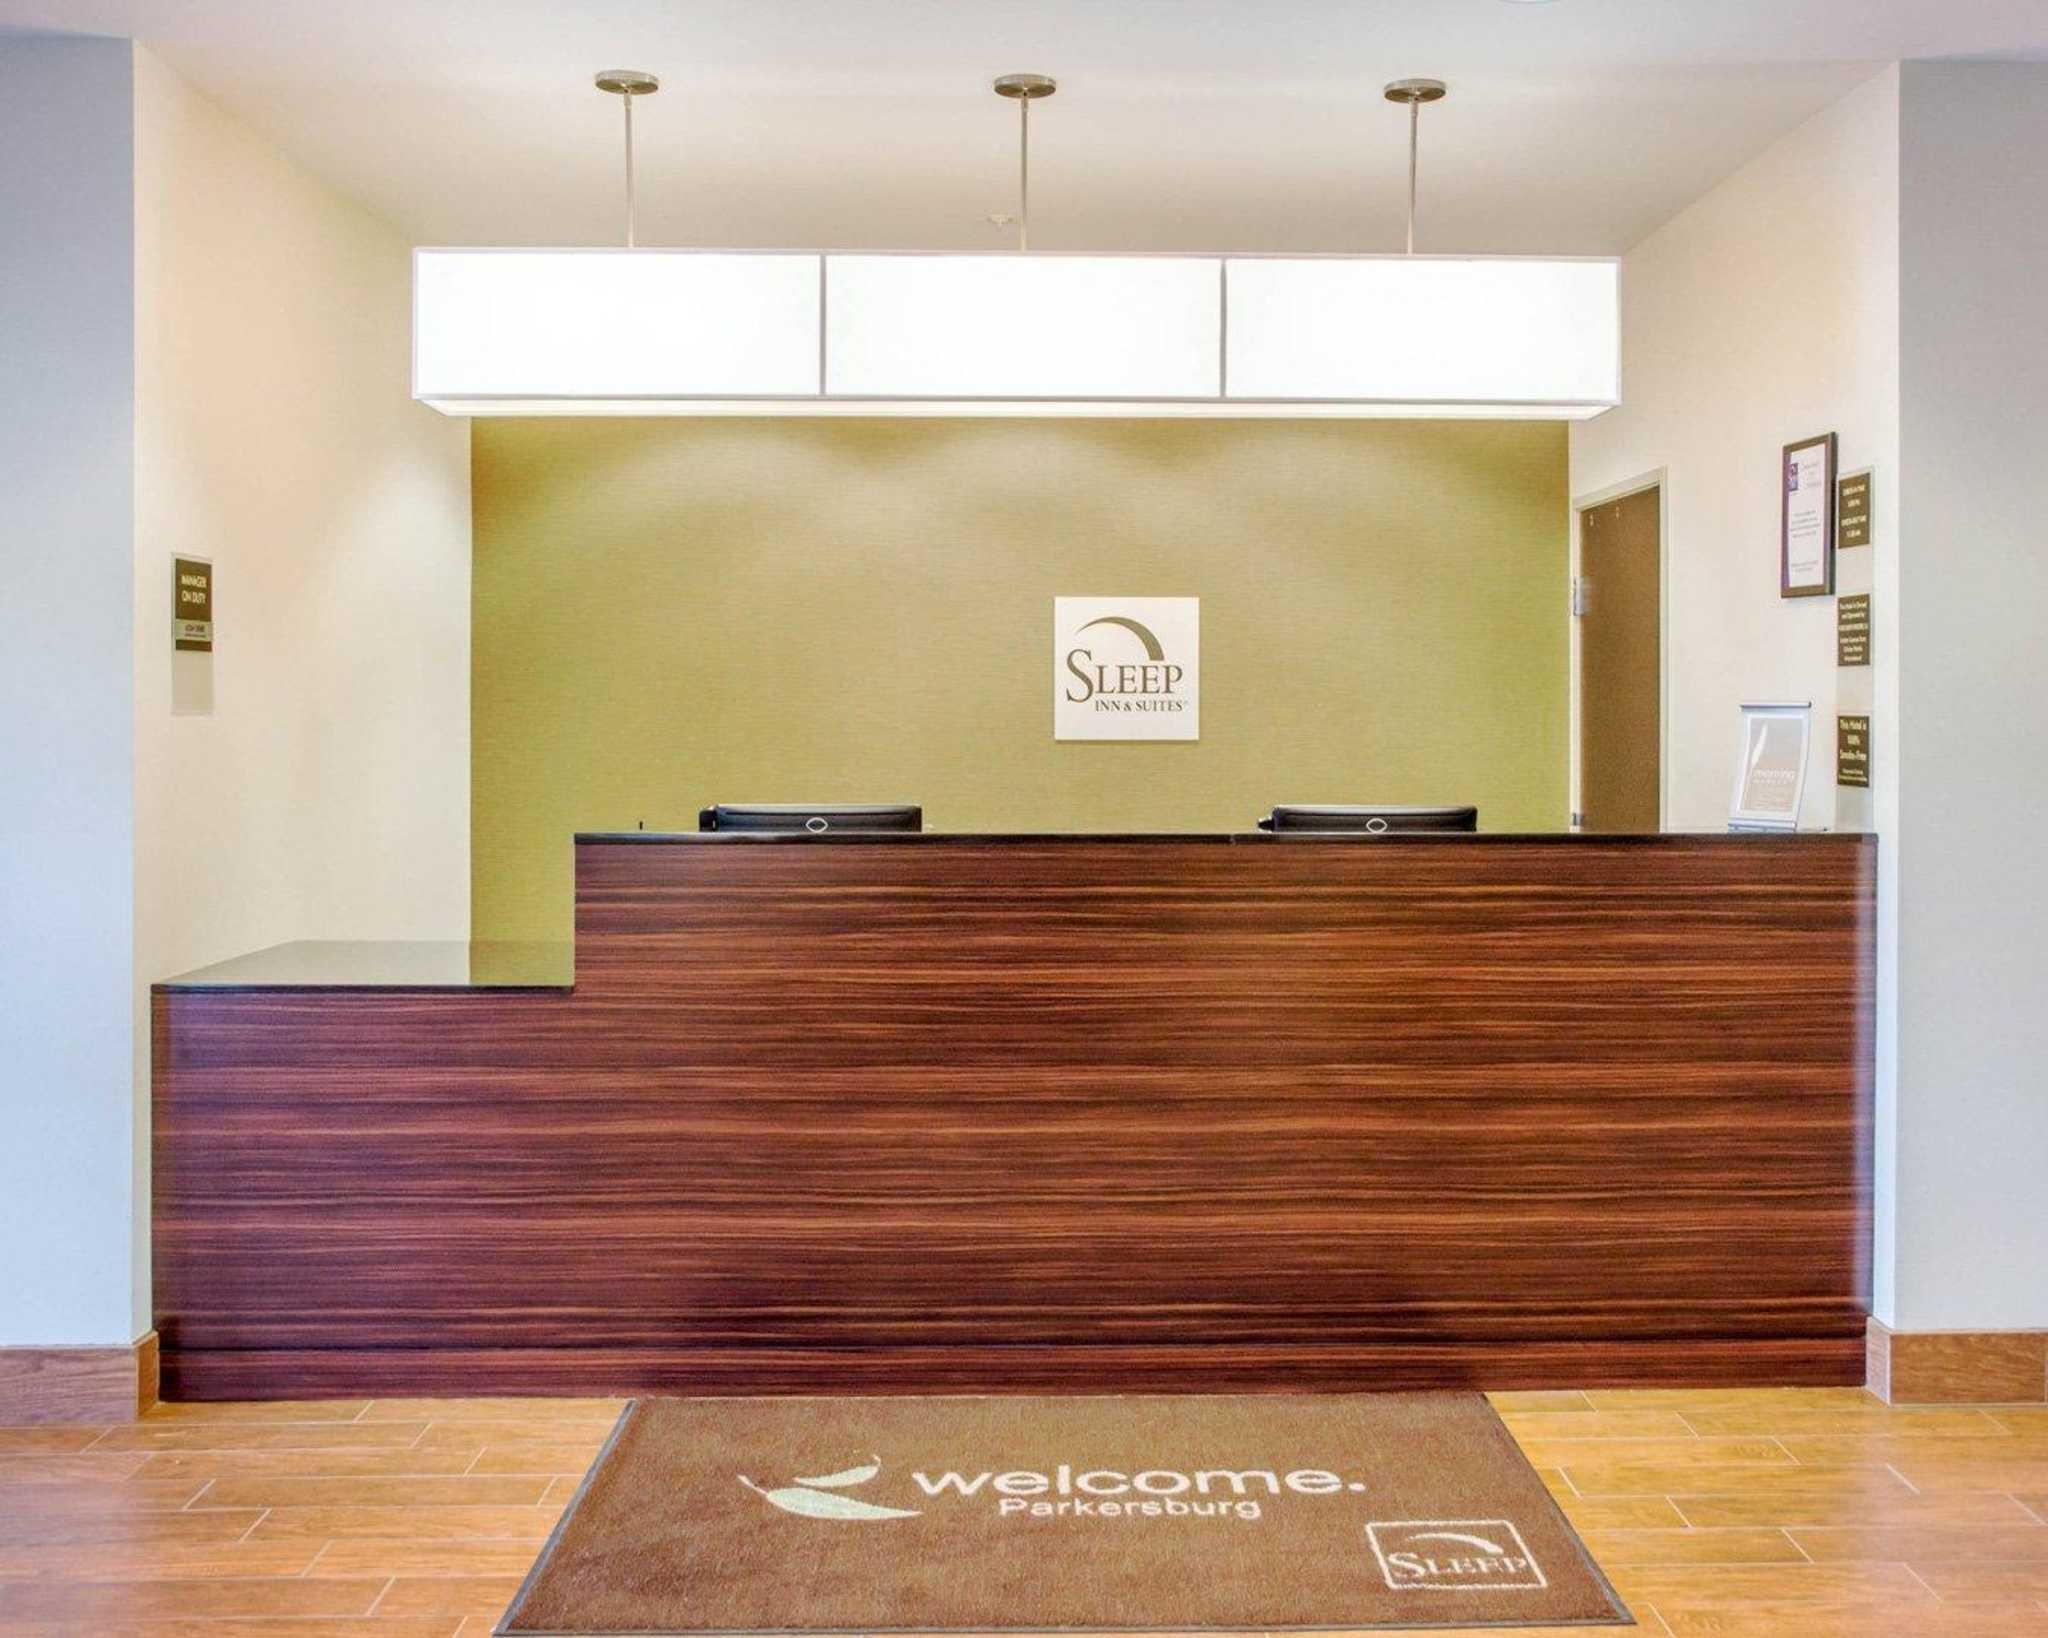 Sleep Inn & Suites Parkersburg-Marietta image 18